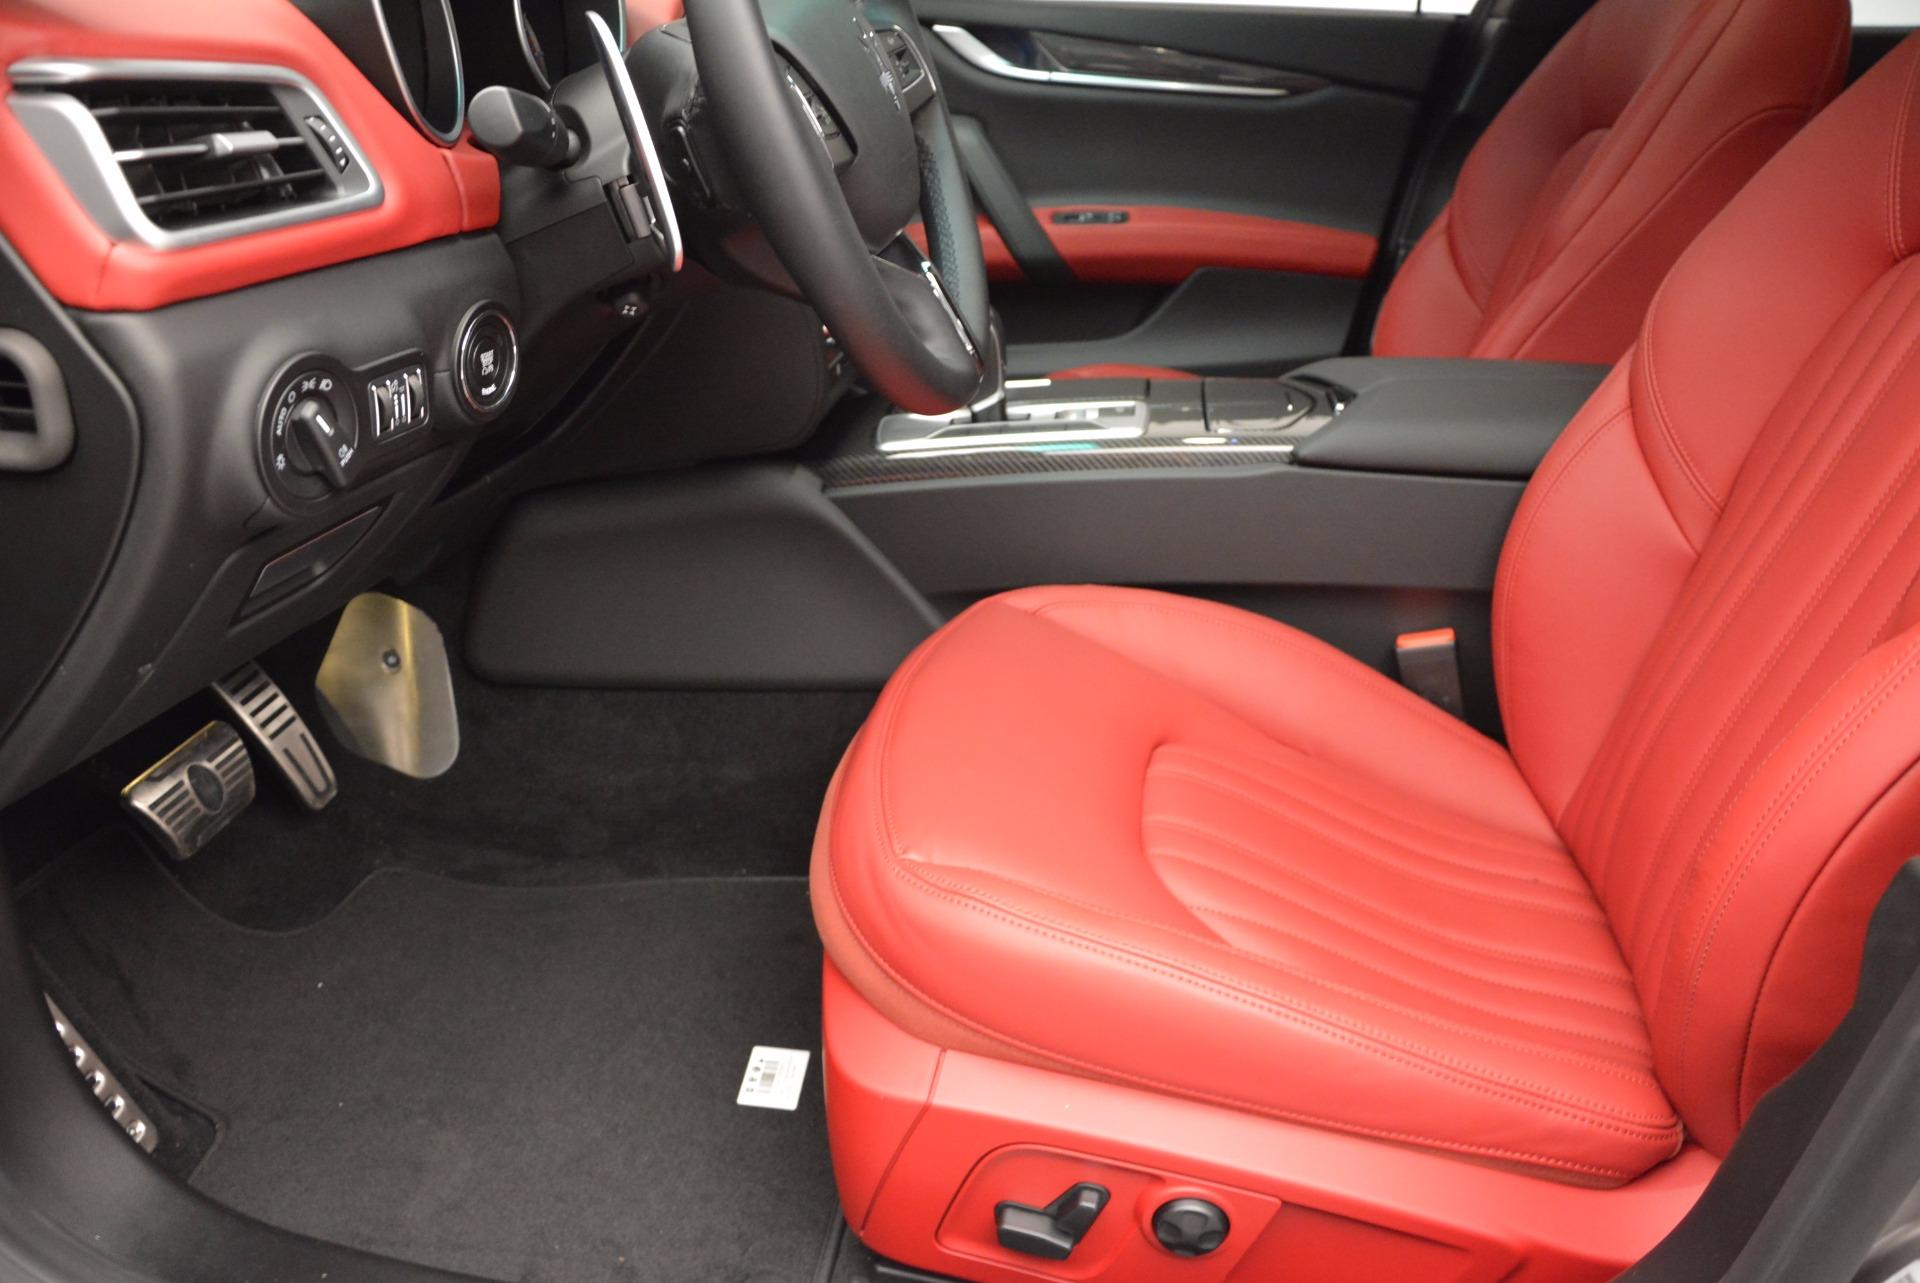 Used 2015 Maserati Ghibli S Q4 For Sale In Greenwich, CT 1290_p14